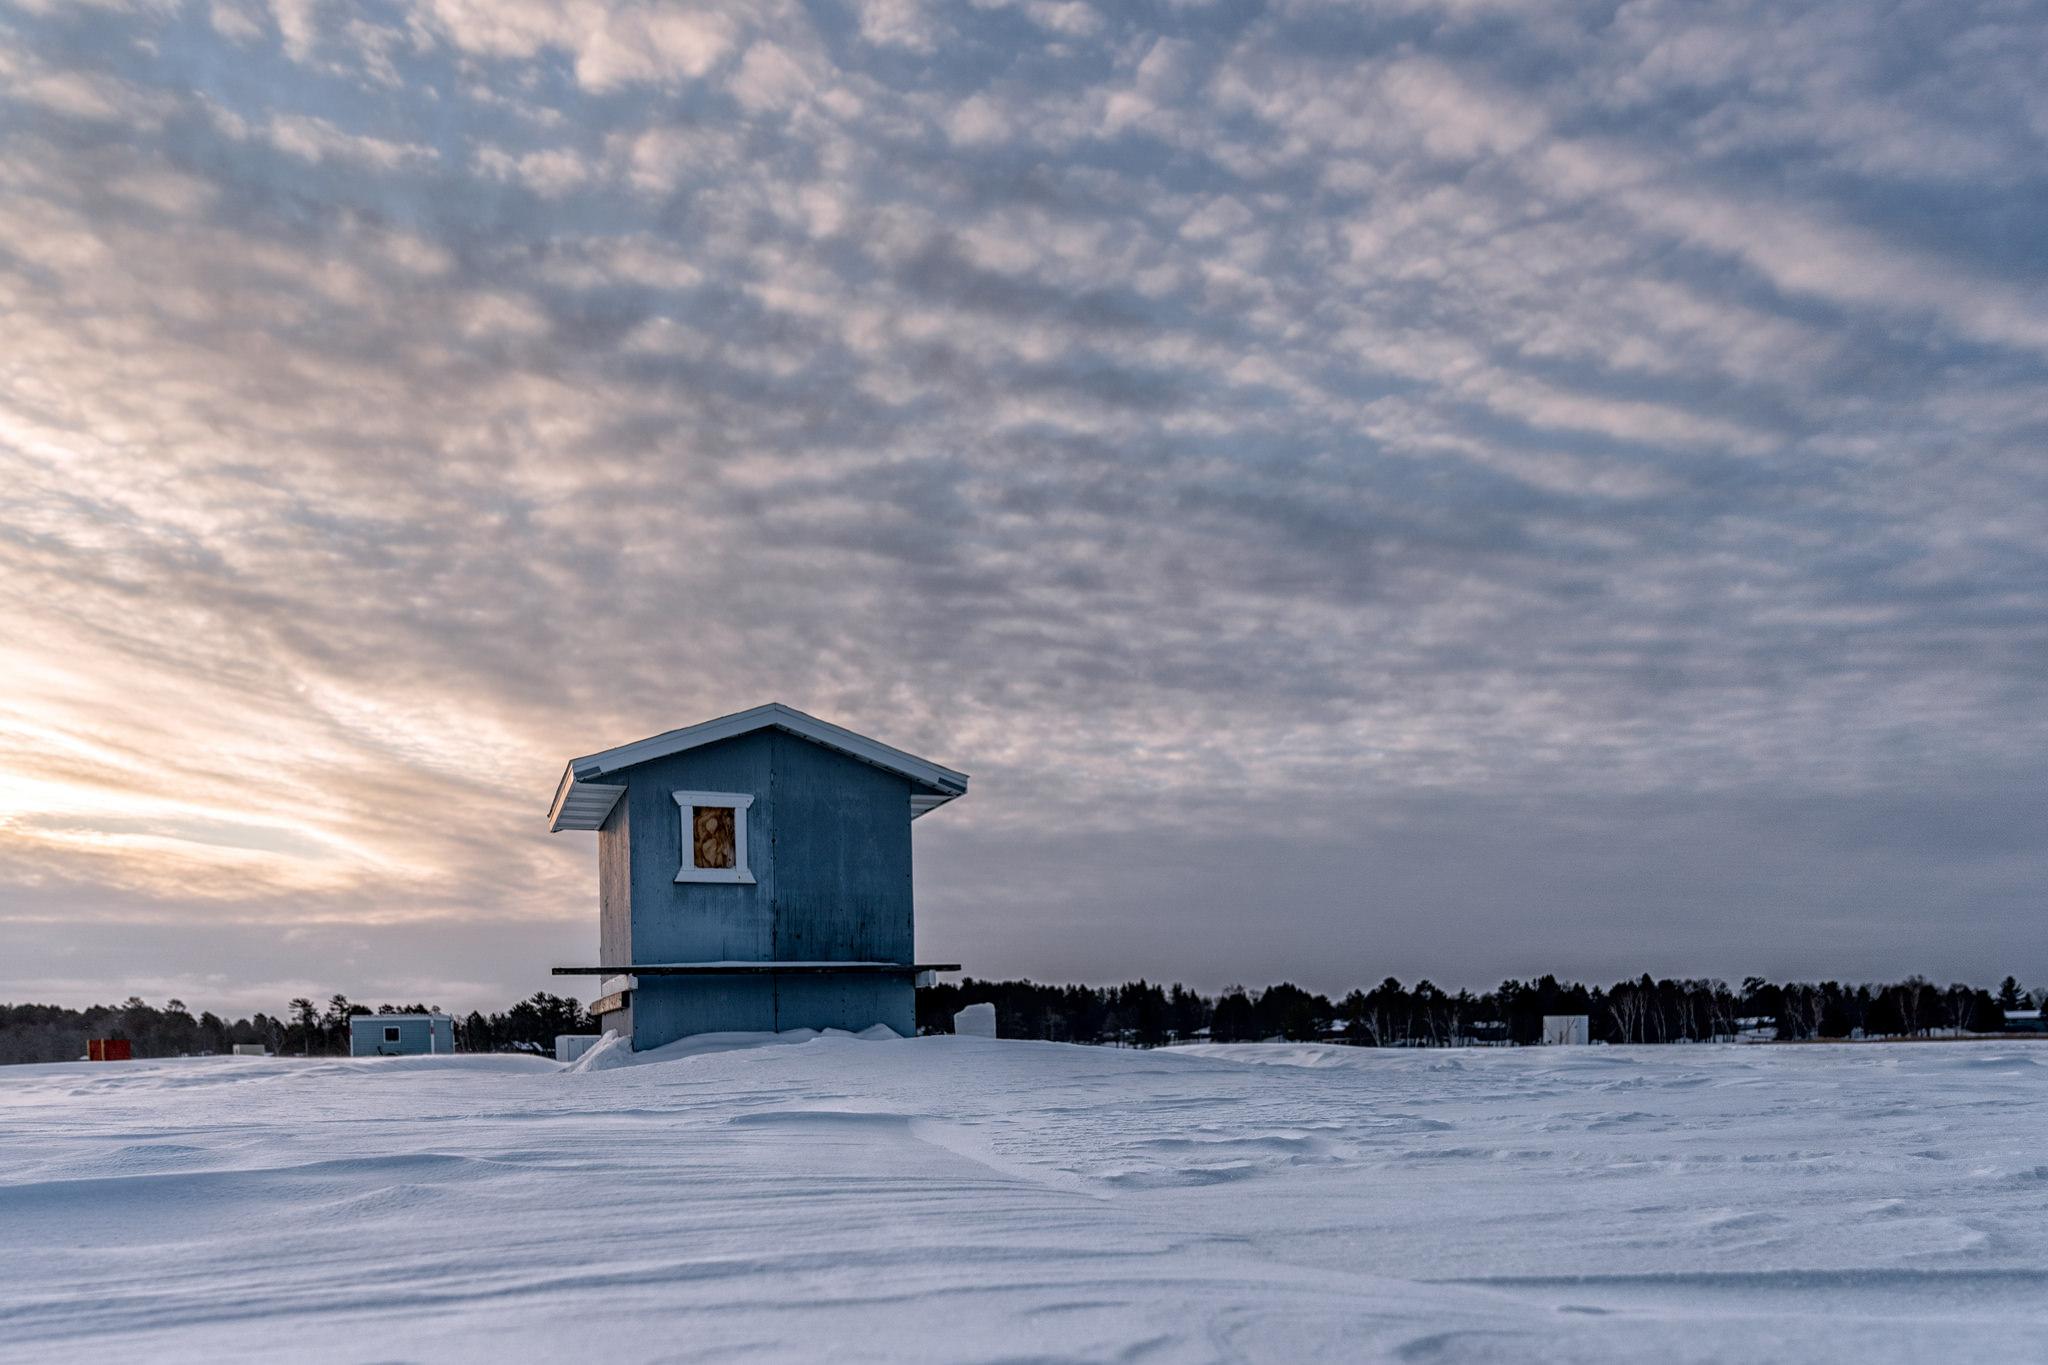 Ice fishing house on Fishhook Lake, Park Rapids MN